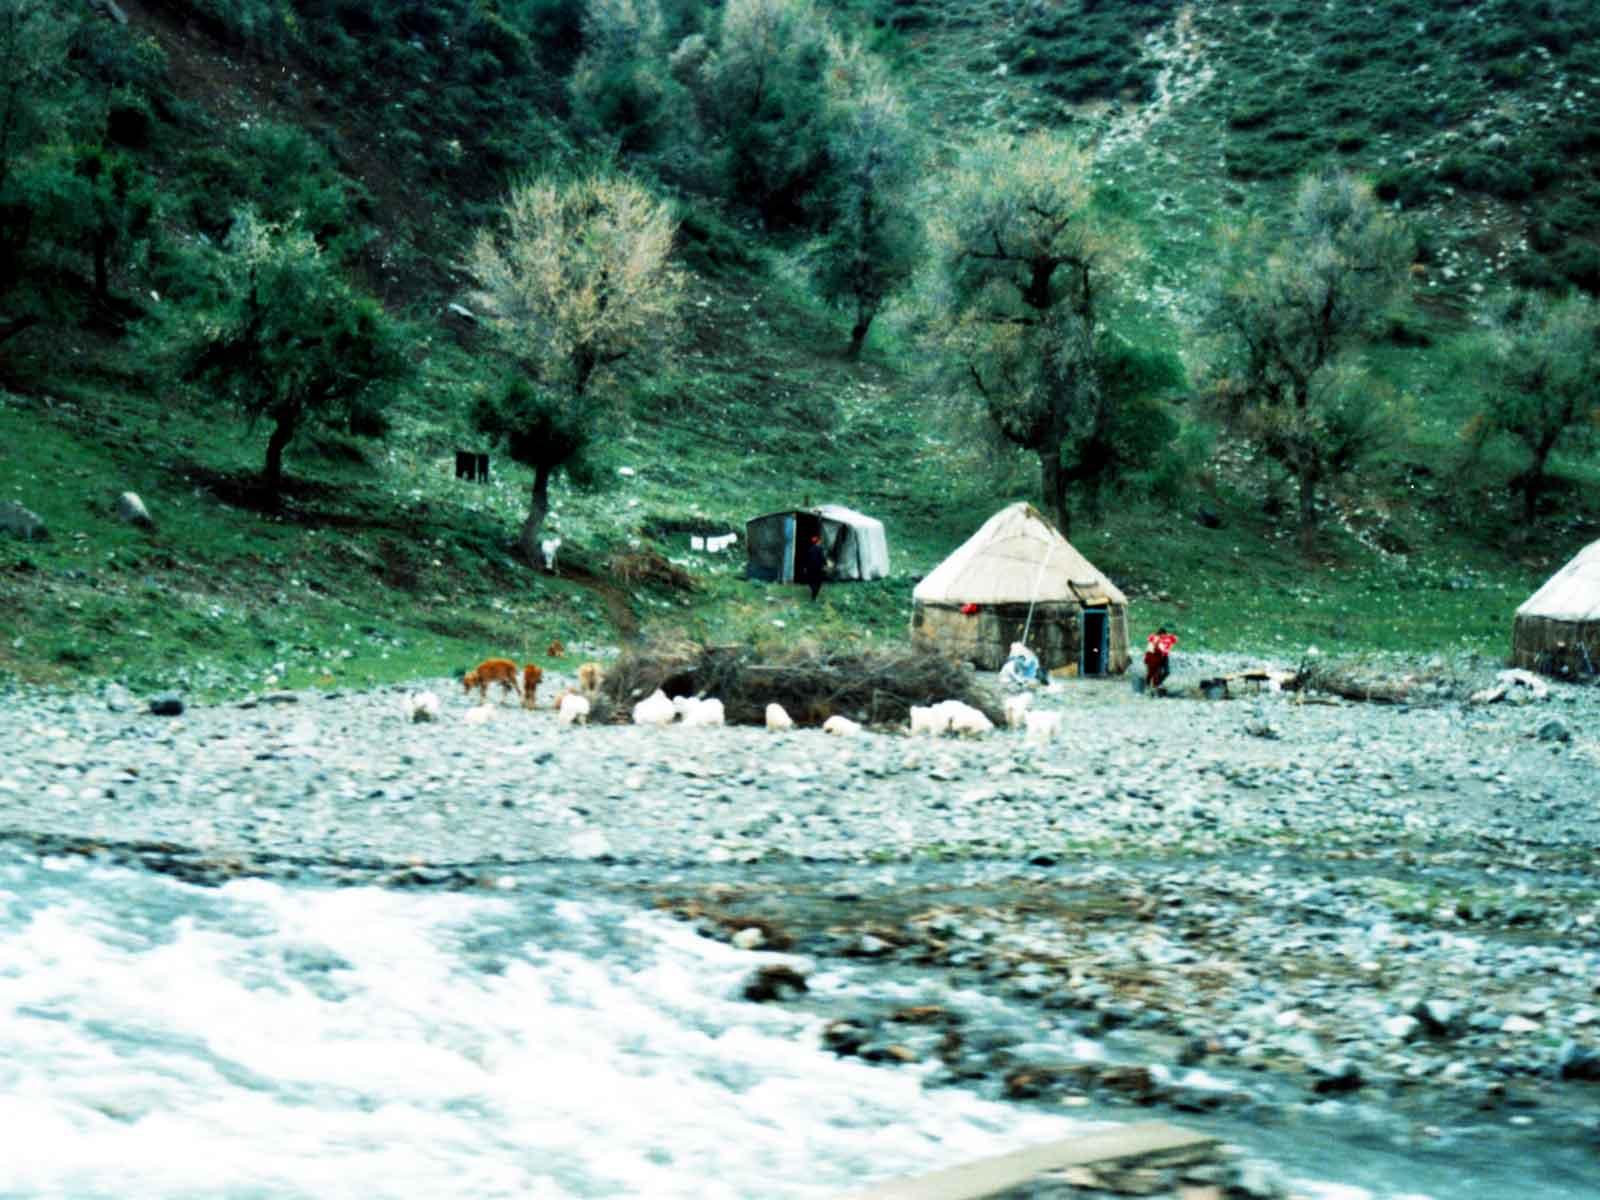 Kazakh yurts - Tianshan - Heavenly Mountains - Urumqi China - 1995 University of Hawaii - Silk Road Study Tour - Steven Andrew Martin